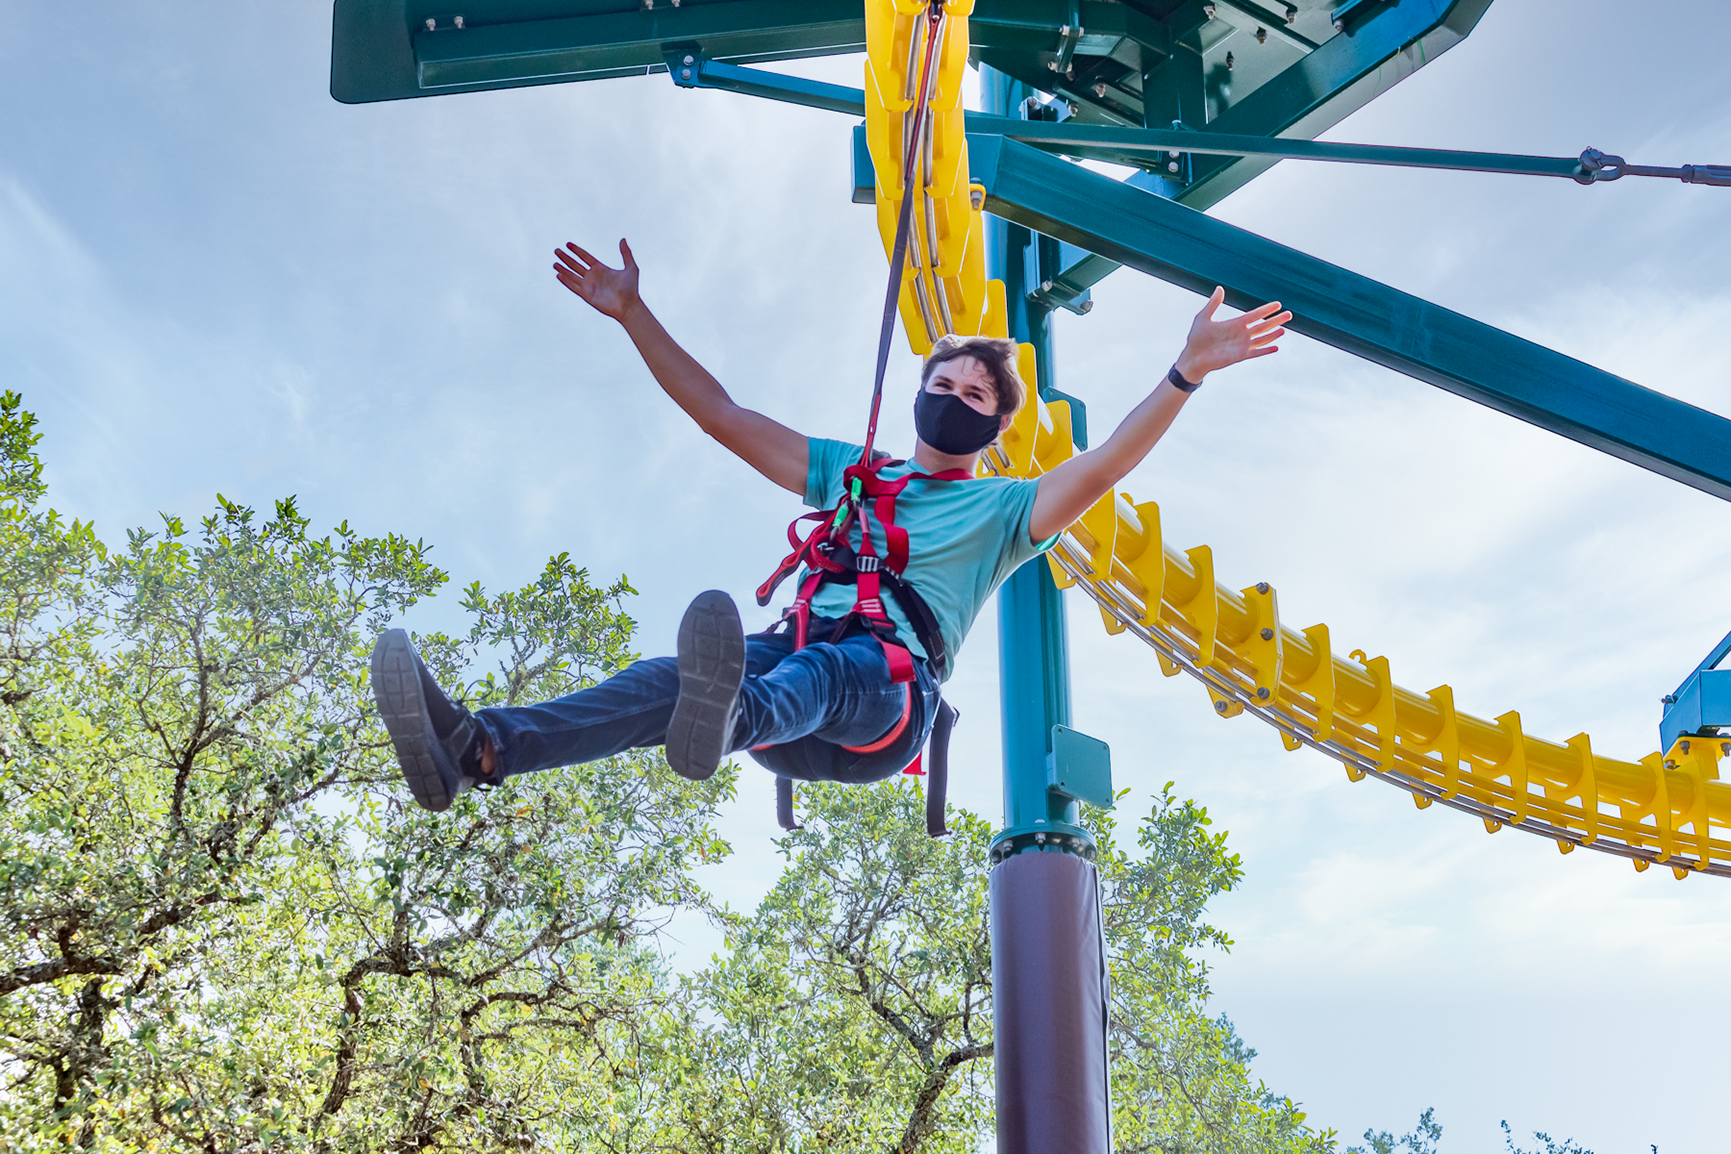 Young man zipping through the air on a zip rail hands free | Natural Bridge Caverns